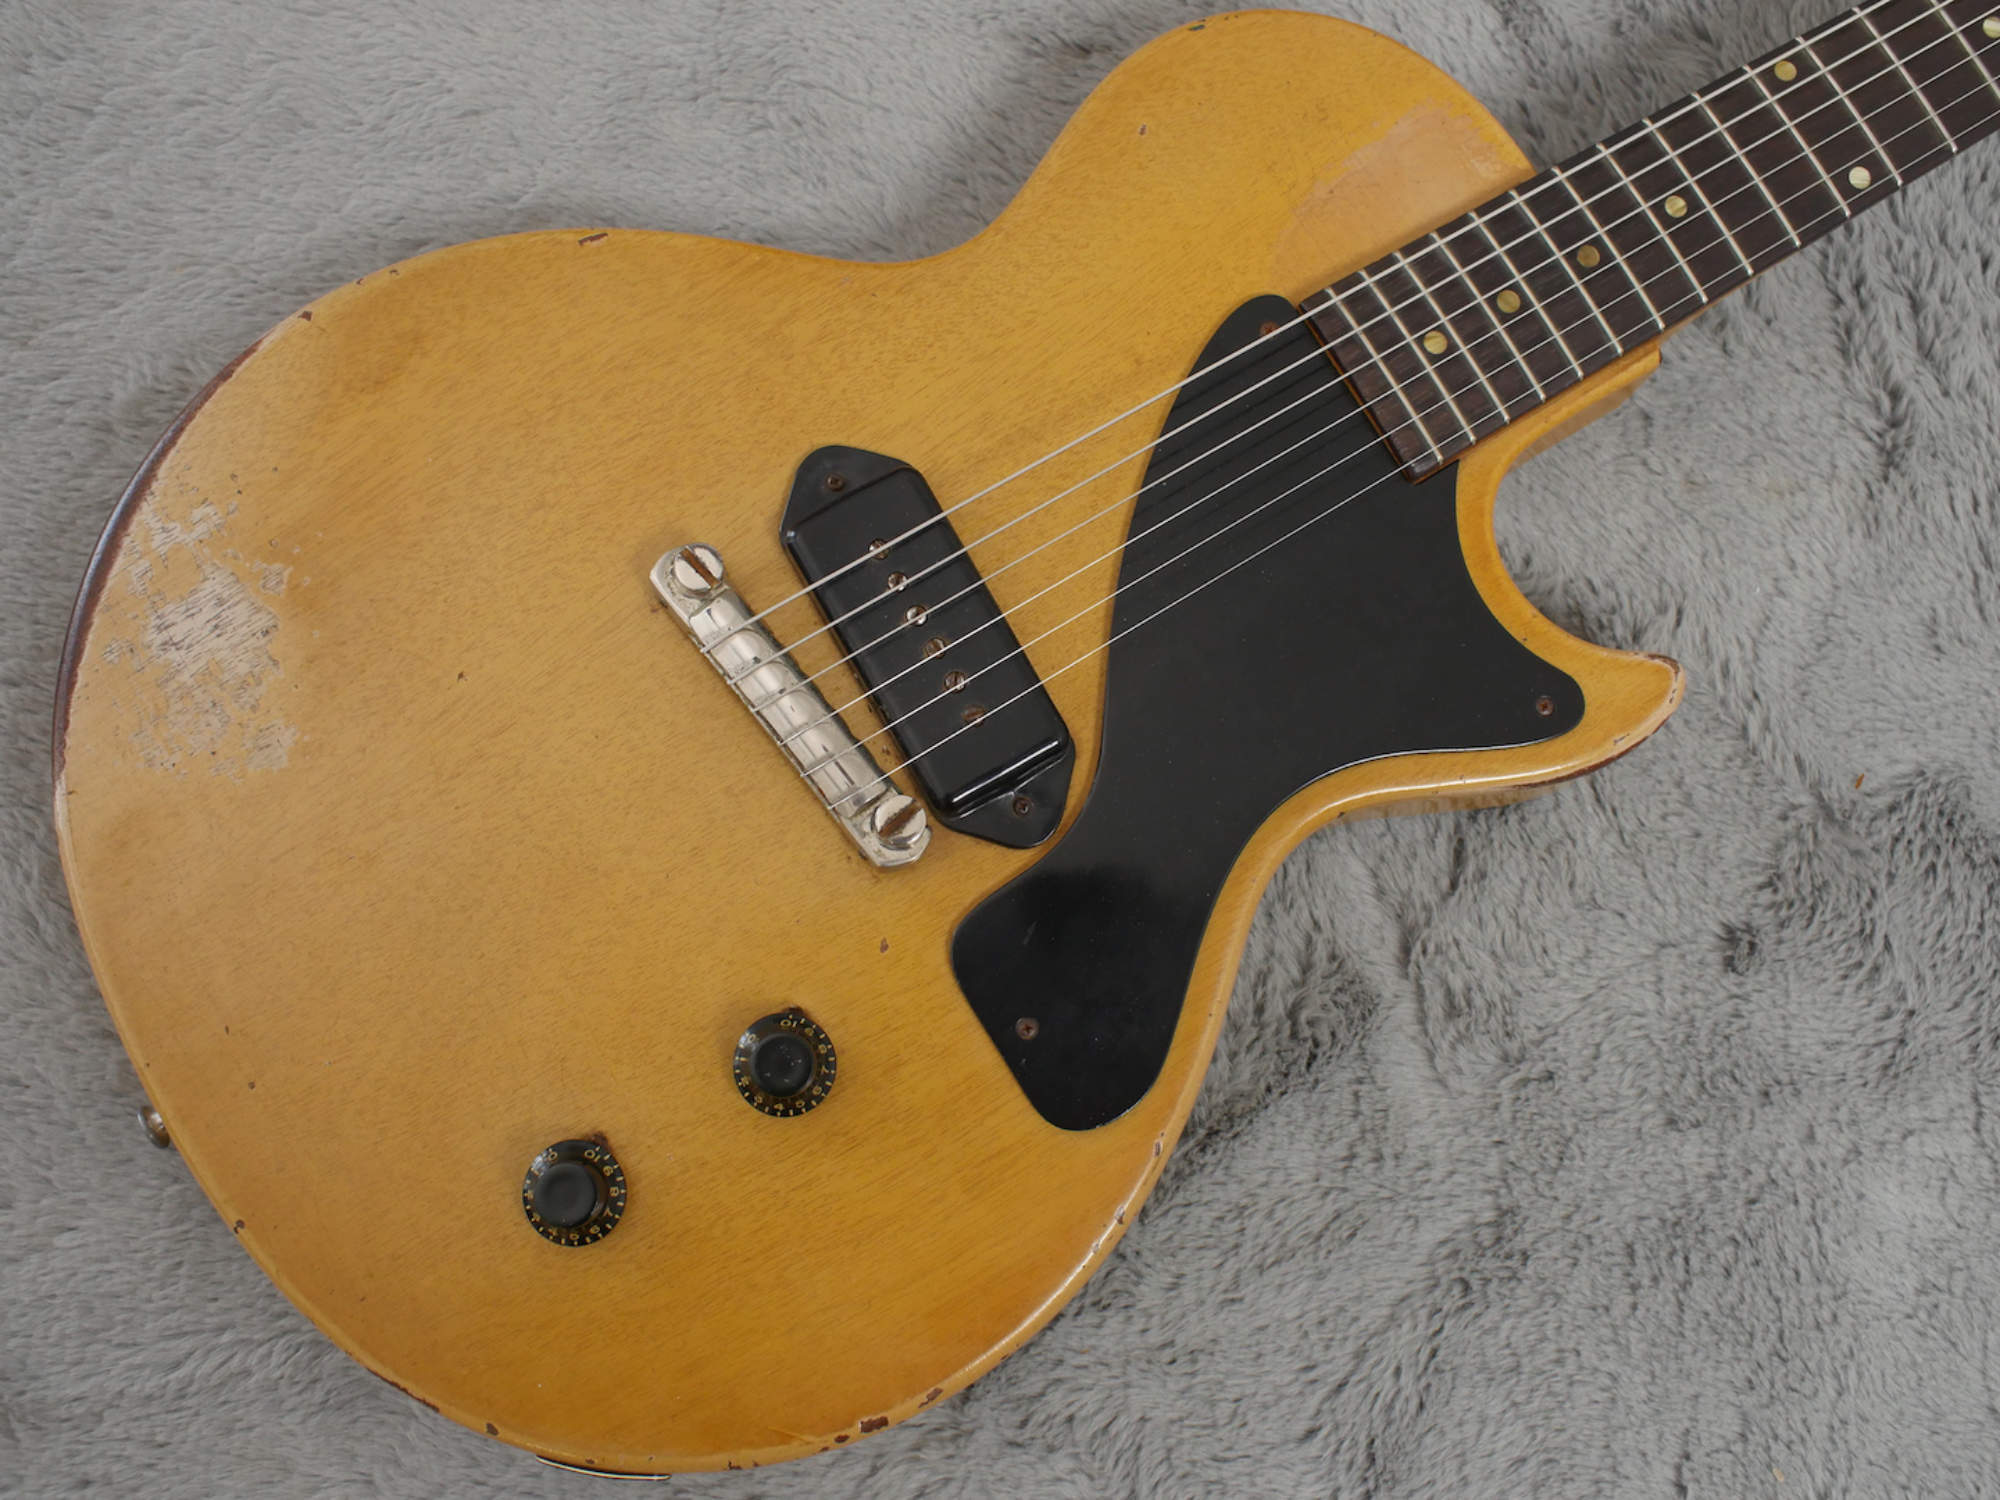 1956 Gibson Les Paul TV Junior + OSSC